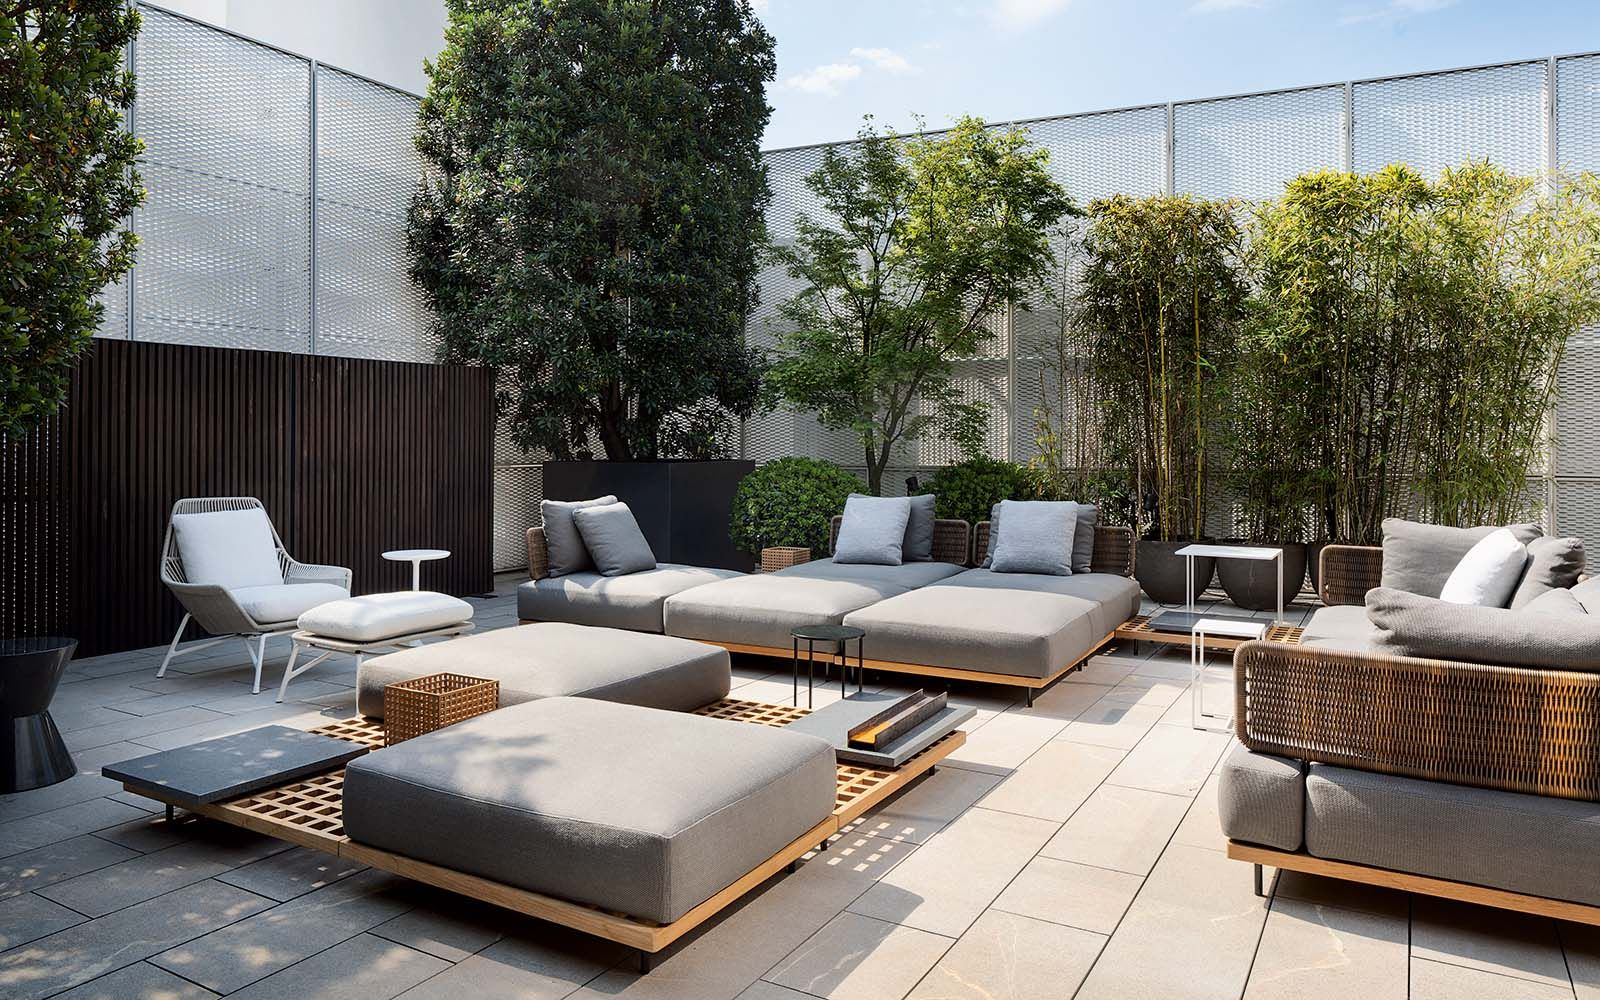 Quadrado outdoor seating system marcio kogan studio mk27 design prince cord outdoor rodolfo dordoni design minotti70 marciokogan outdoor